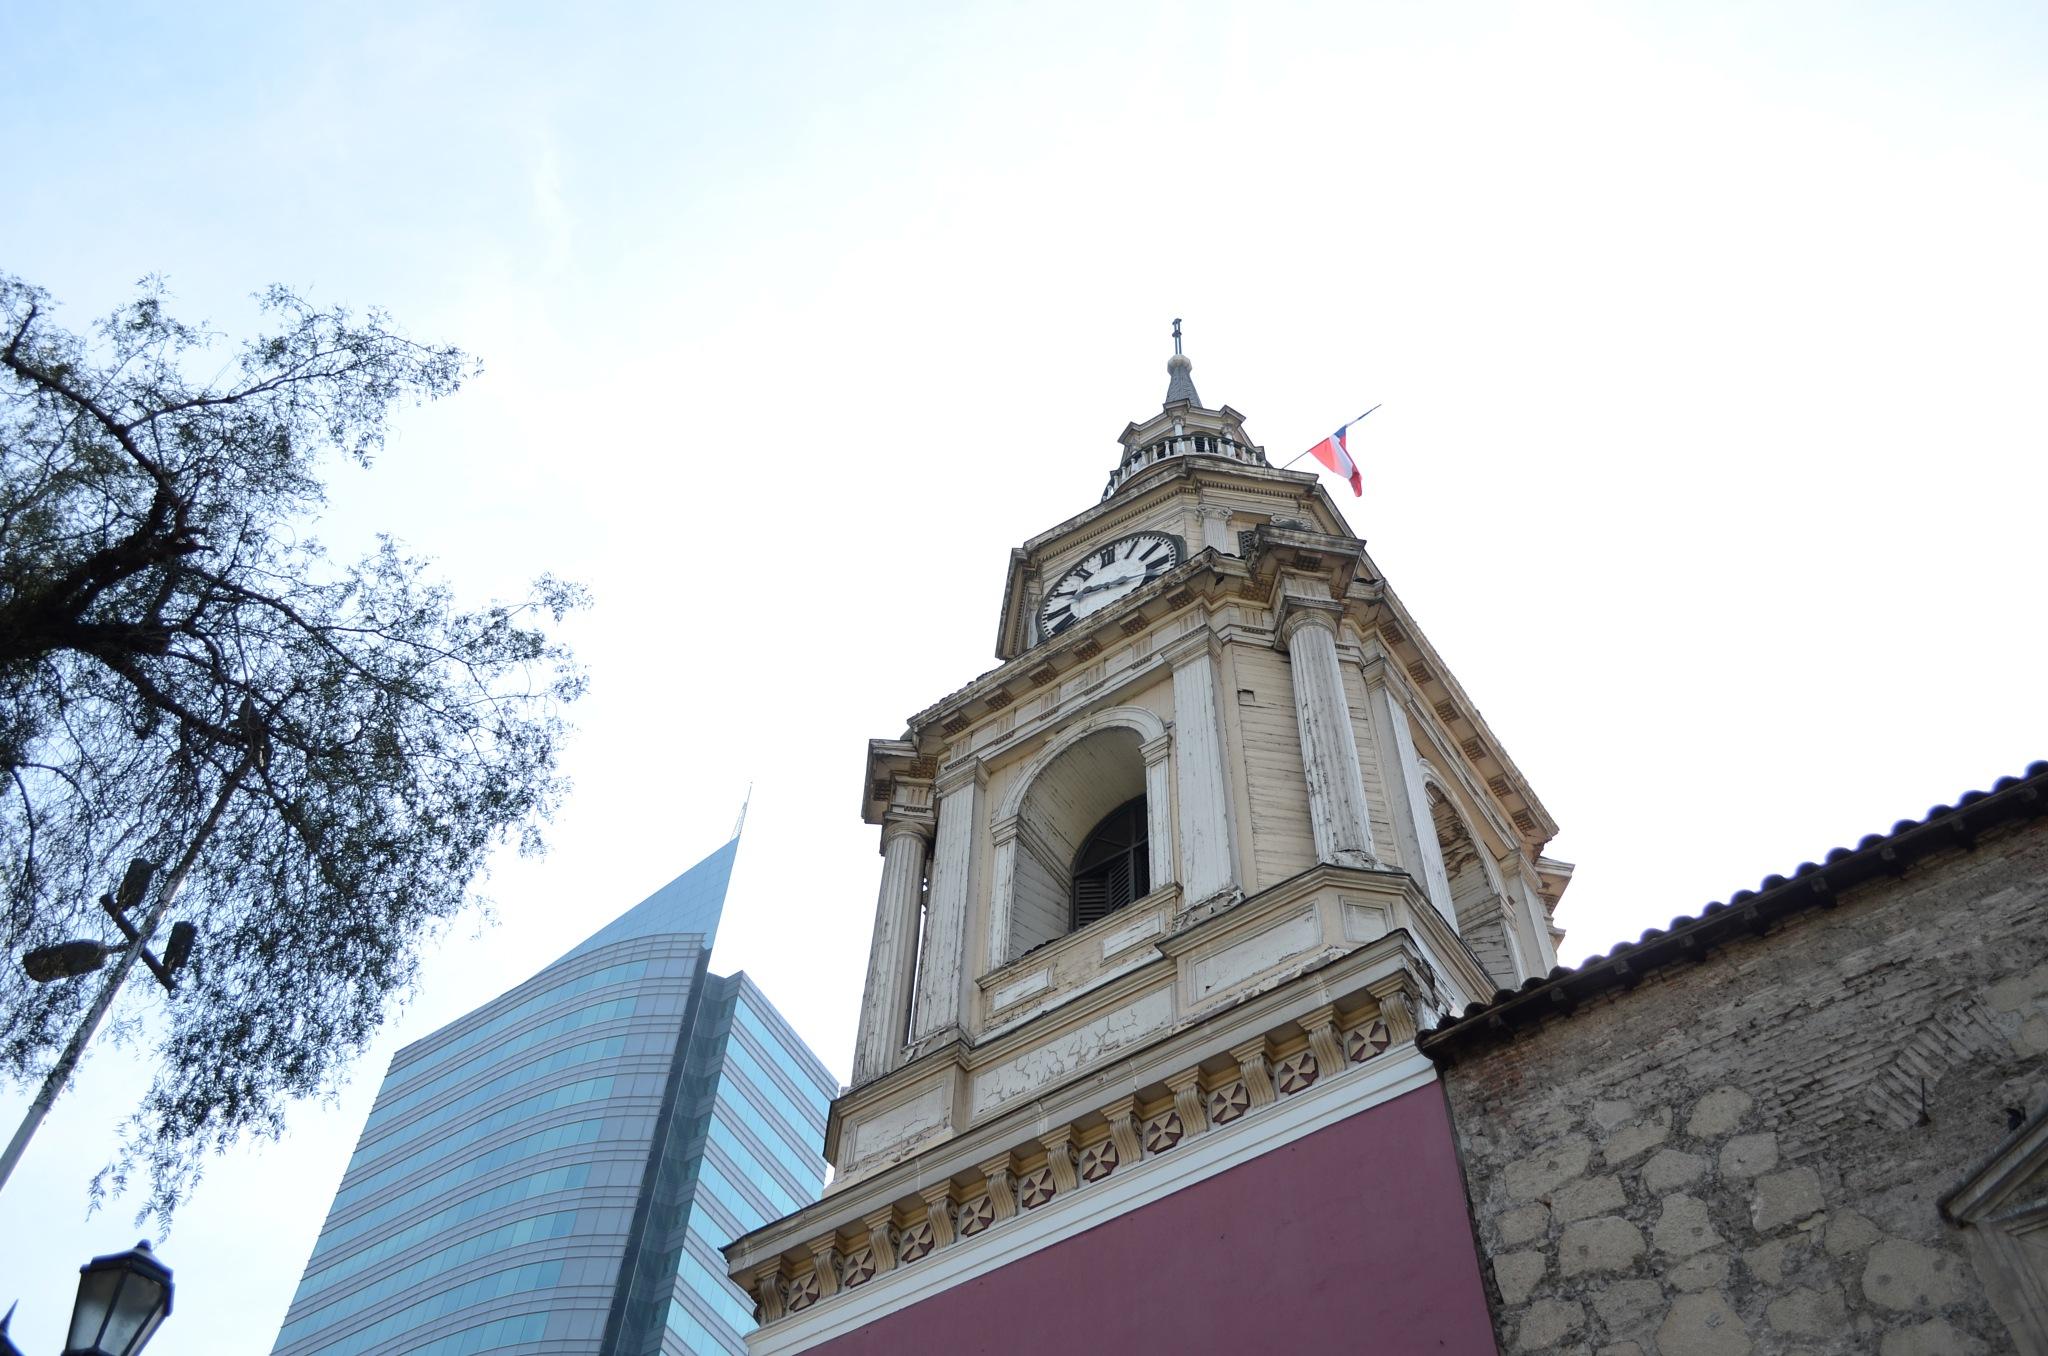 Church of san francisco, santiago de chile july 2016 by Aossandon